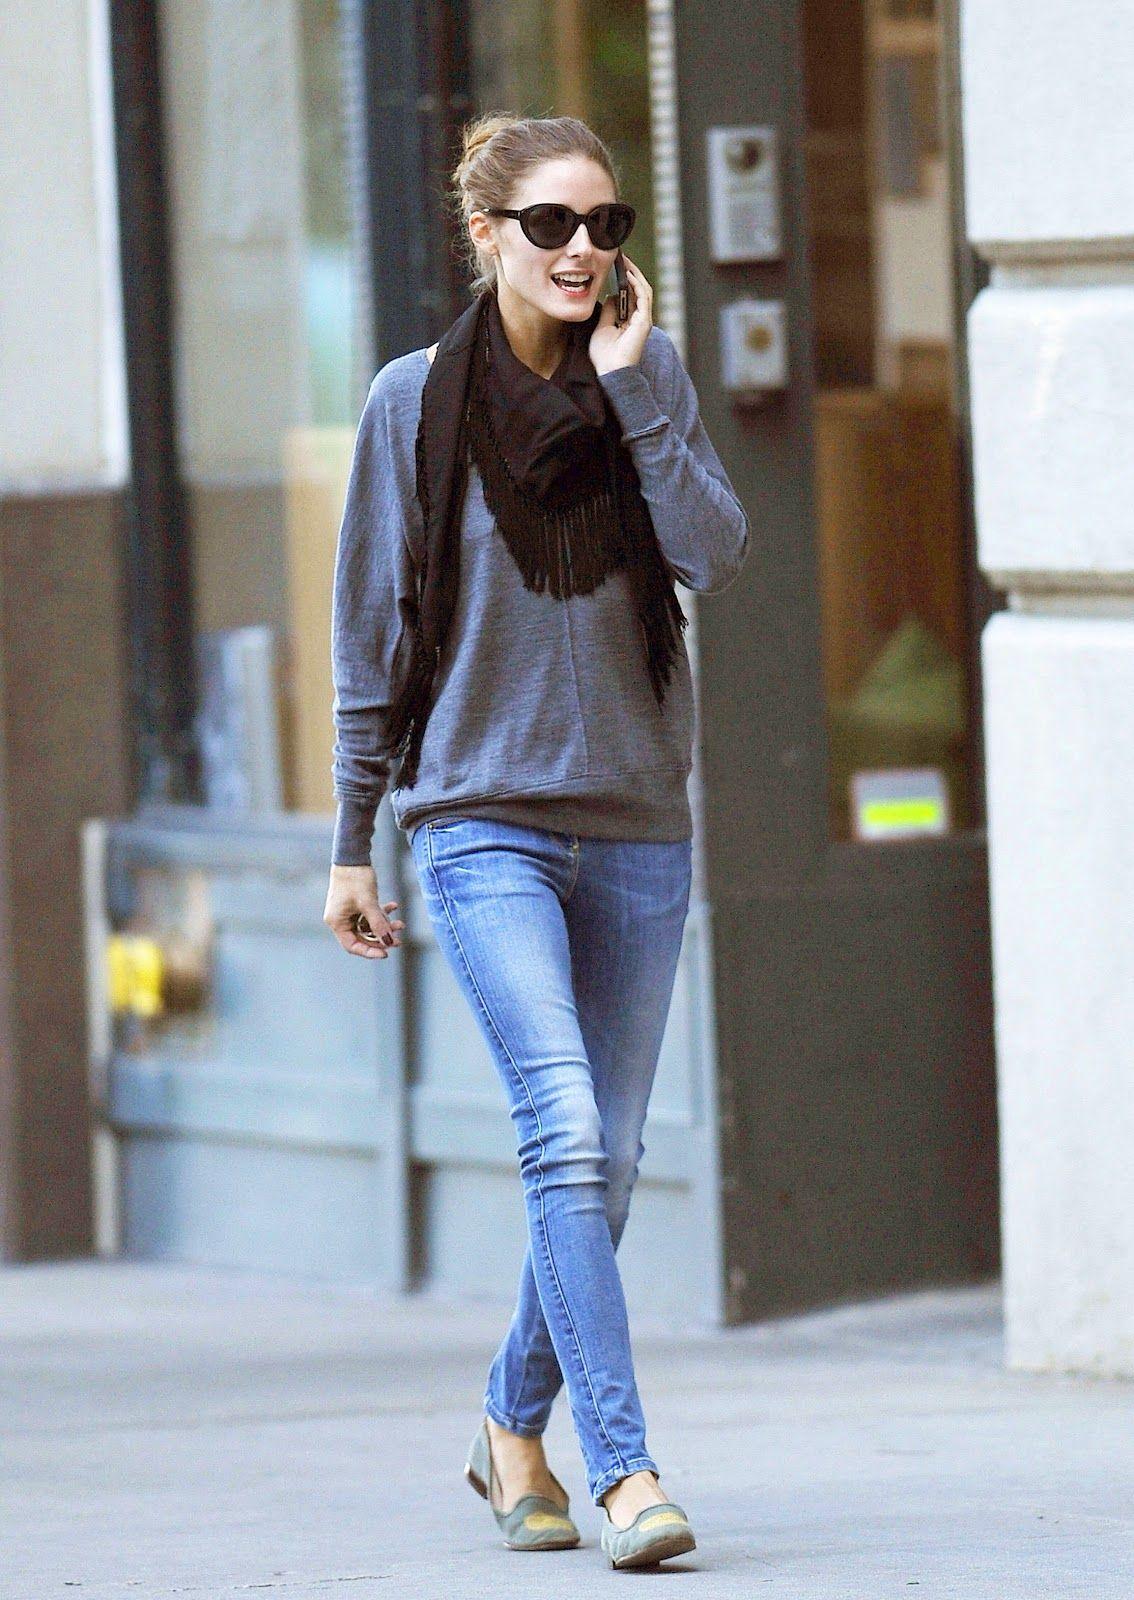 Ungaro emanuel fall winter, Wear you Trendswould a tuxedo blouse